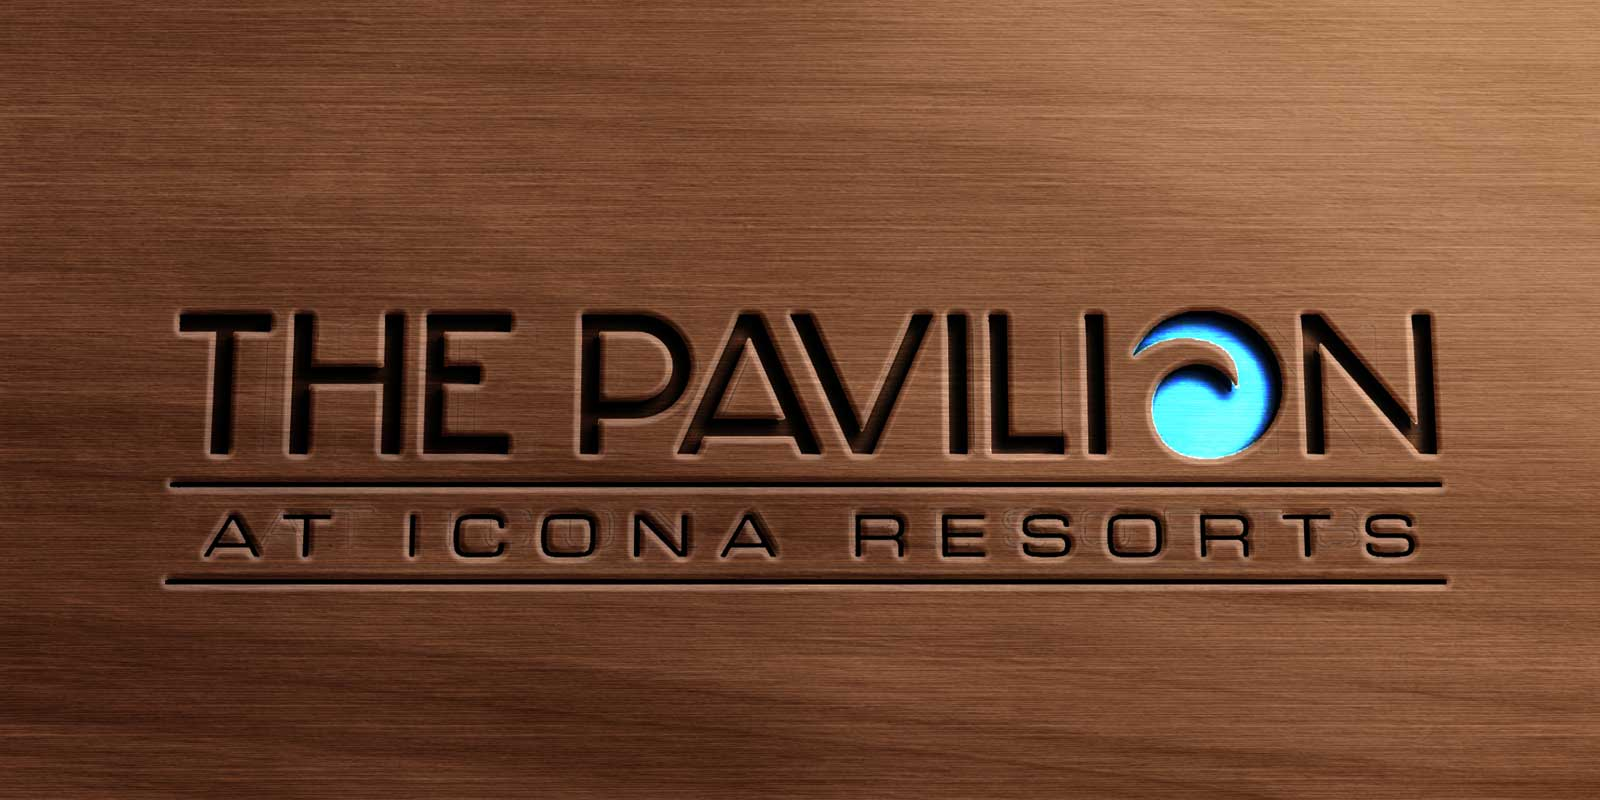 pavillion-Wide-Logos